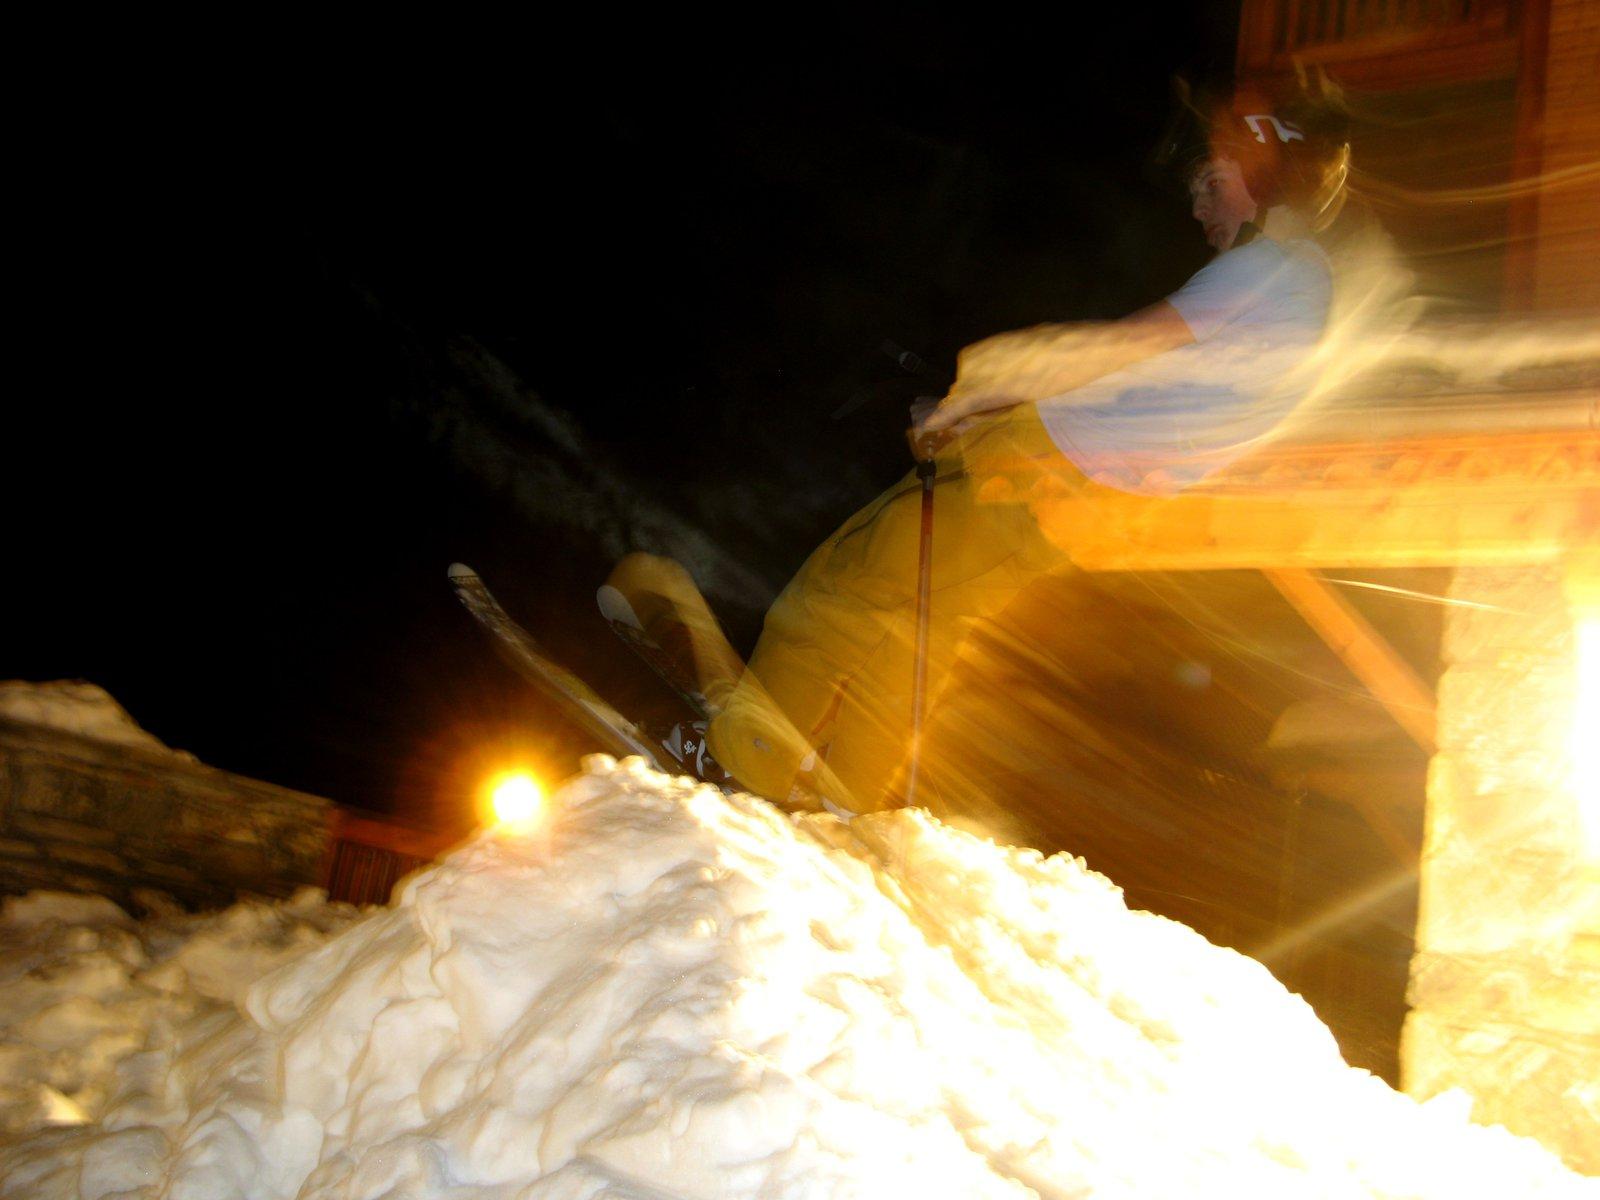 Cool blur